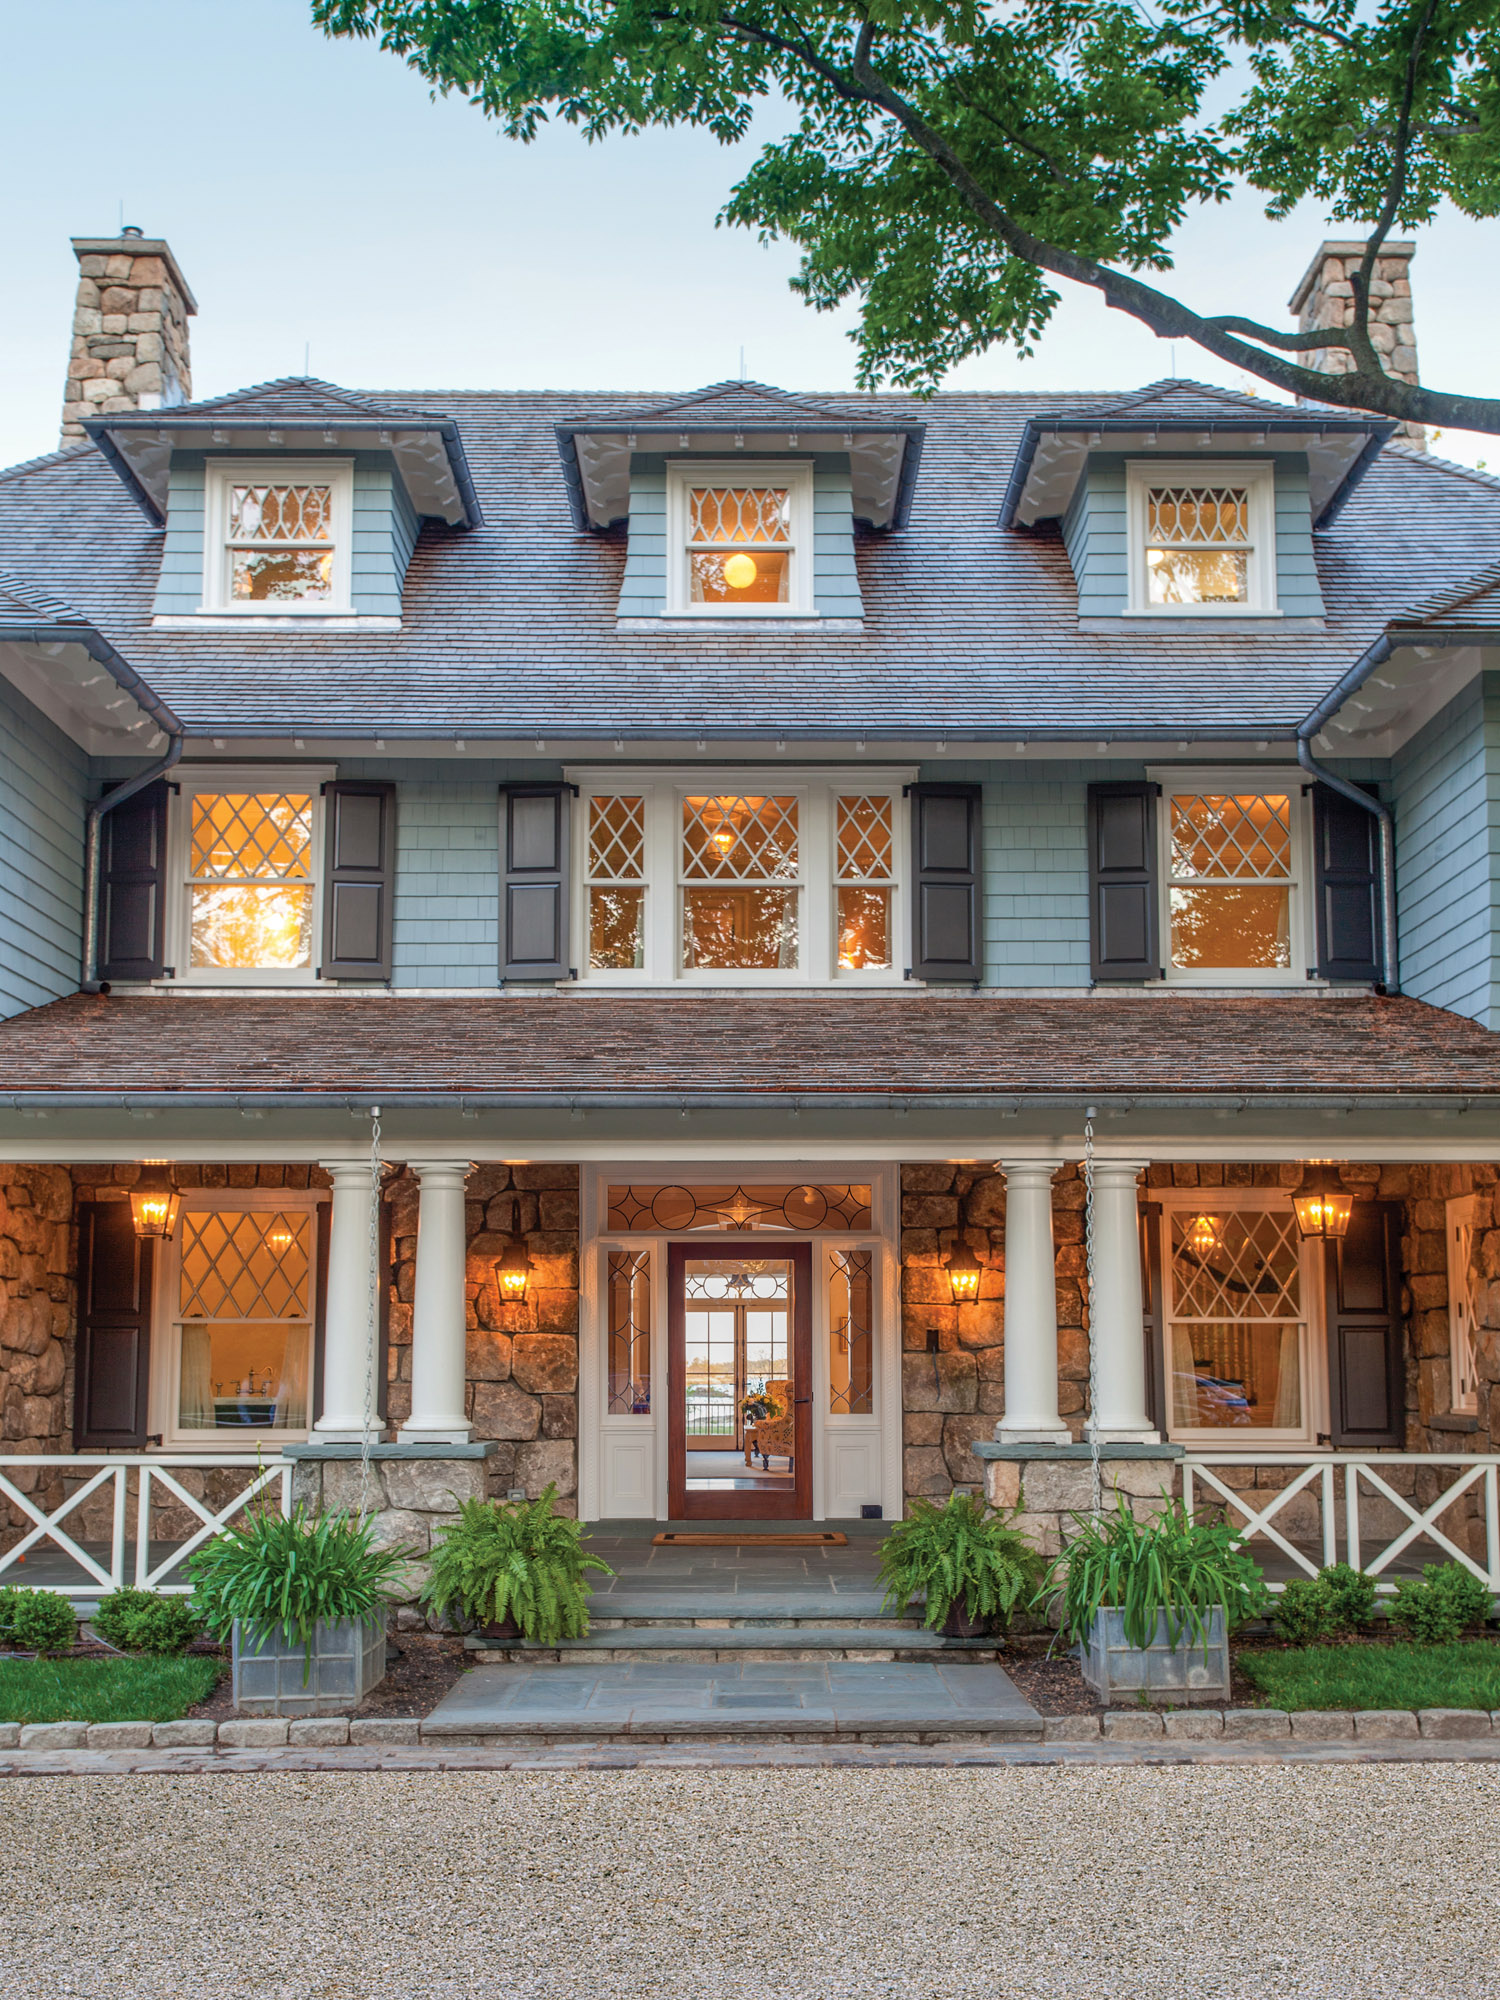 New Old Stone & Shingle Home